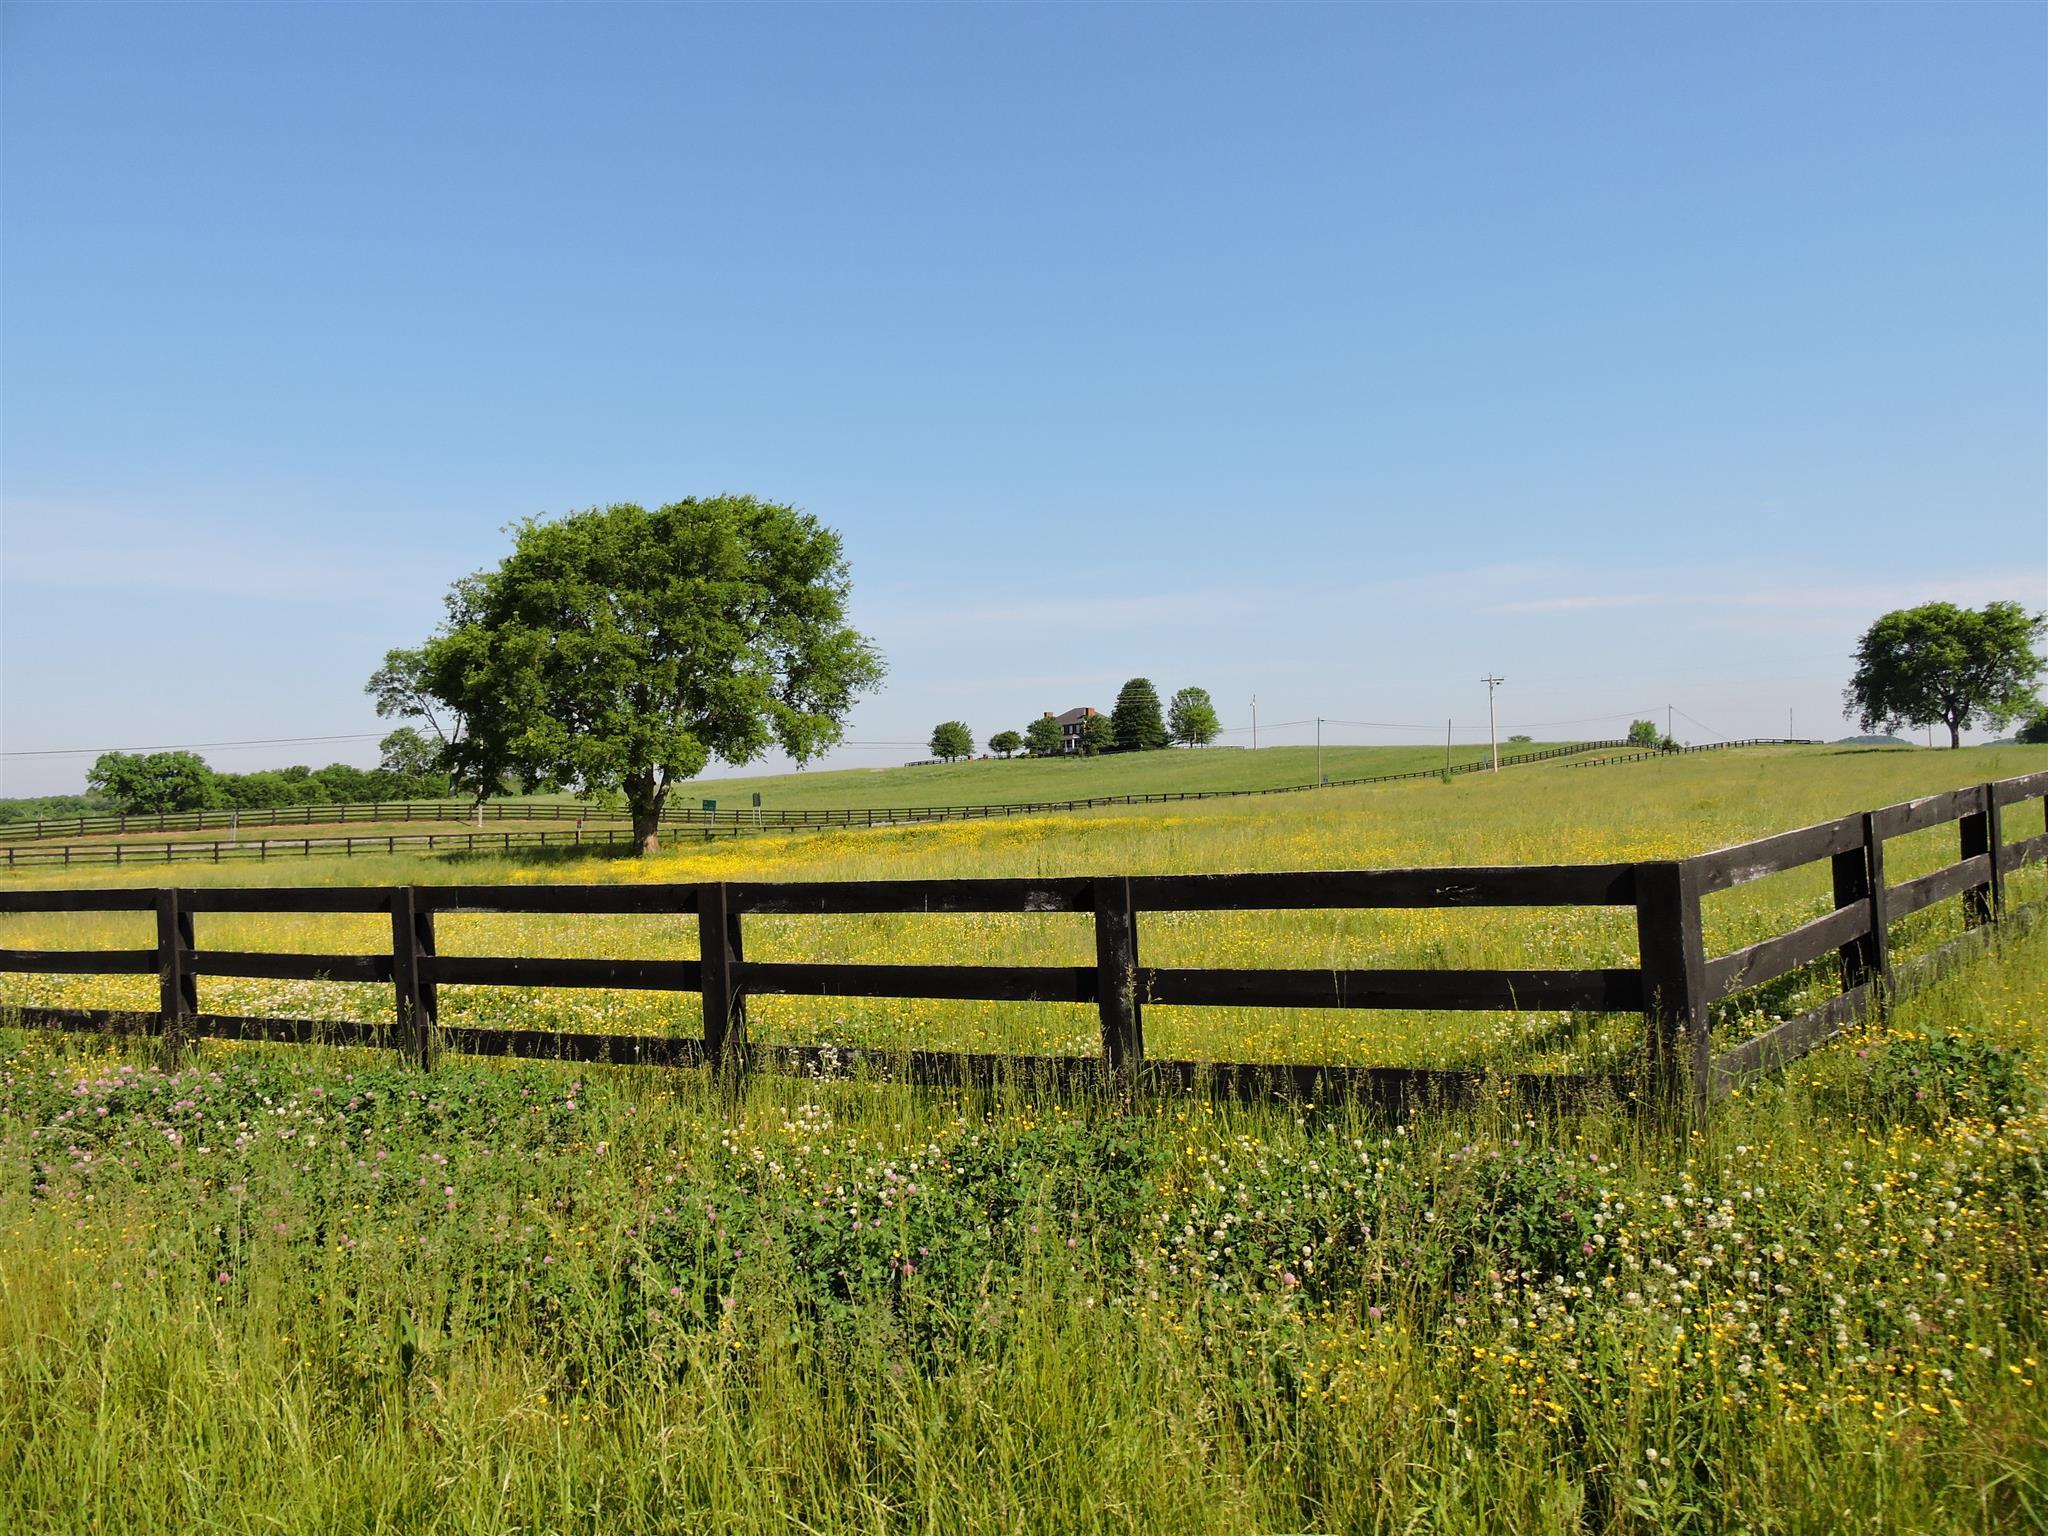 1 Walker Rd, Beechgrove, TN 37018 - Beechgrove, TN real estate listing